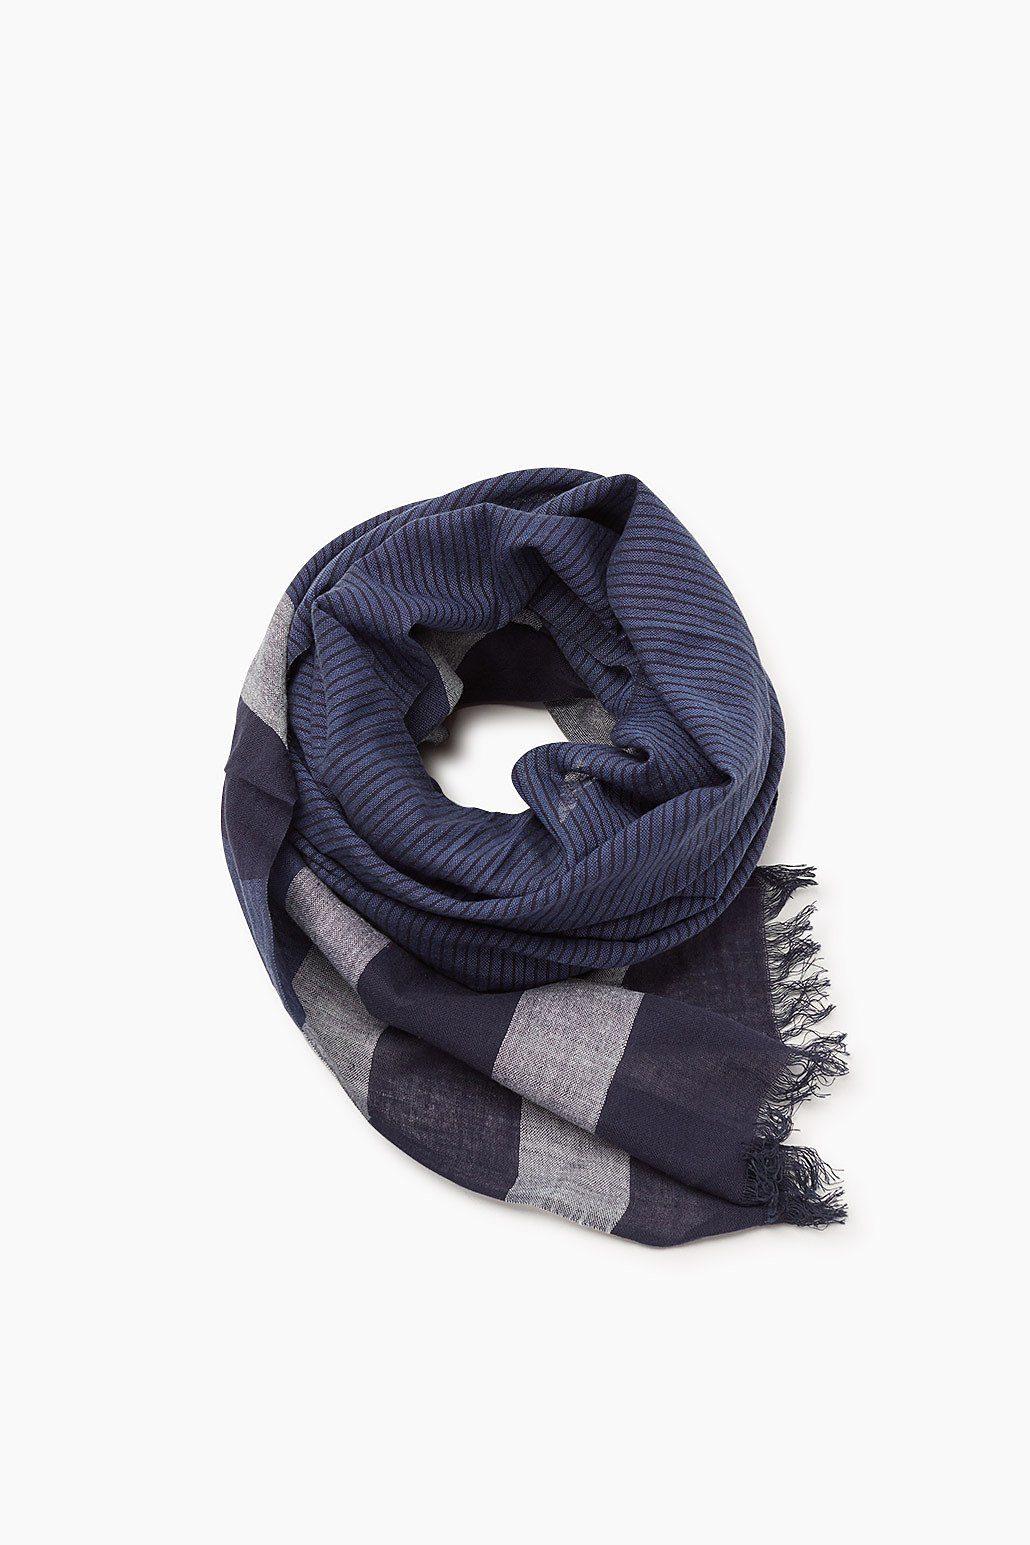 ESPRIT CASUAL Gestreifter Web-Schal, 100% Baumwolle